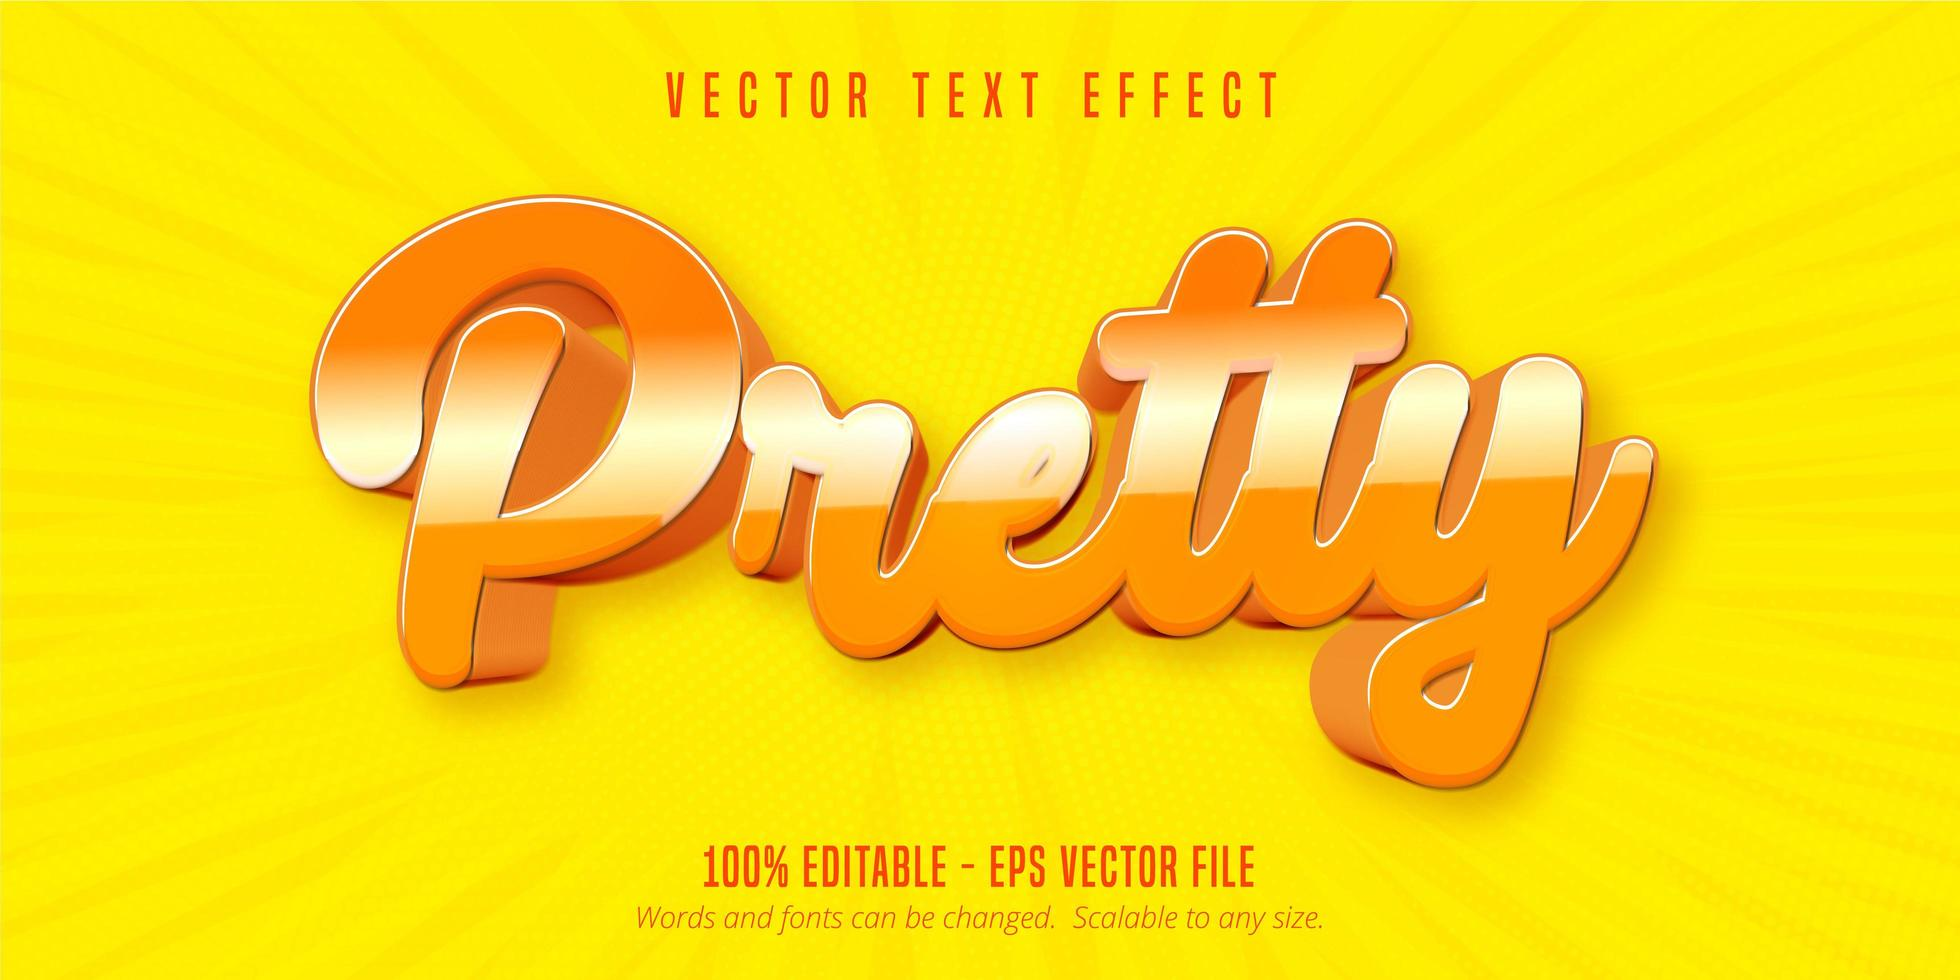 vacker text, tecknad stil text effekt vektor